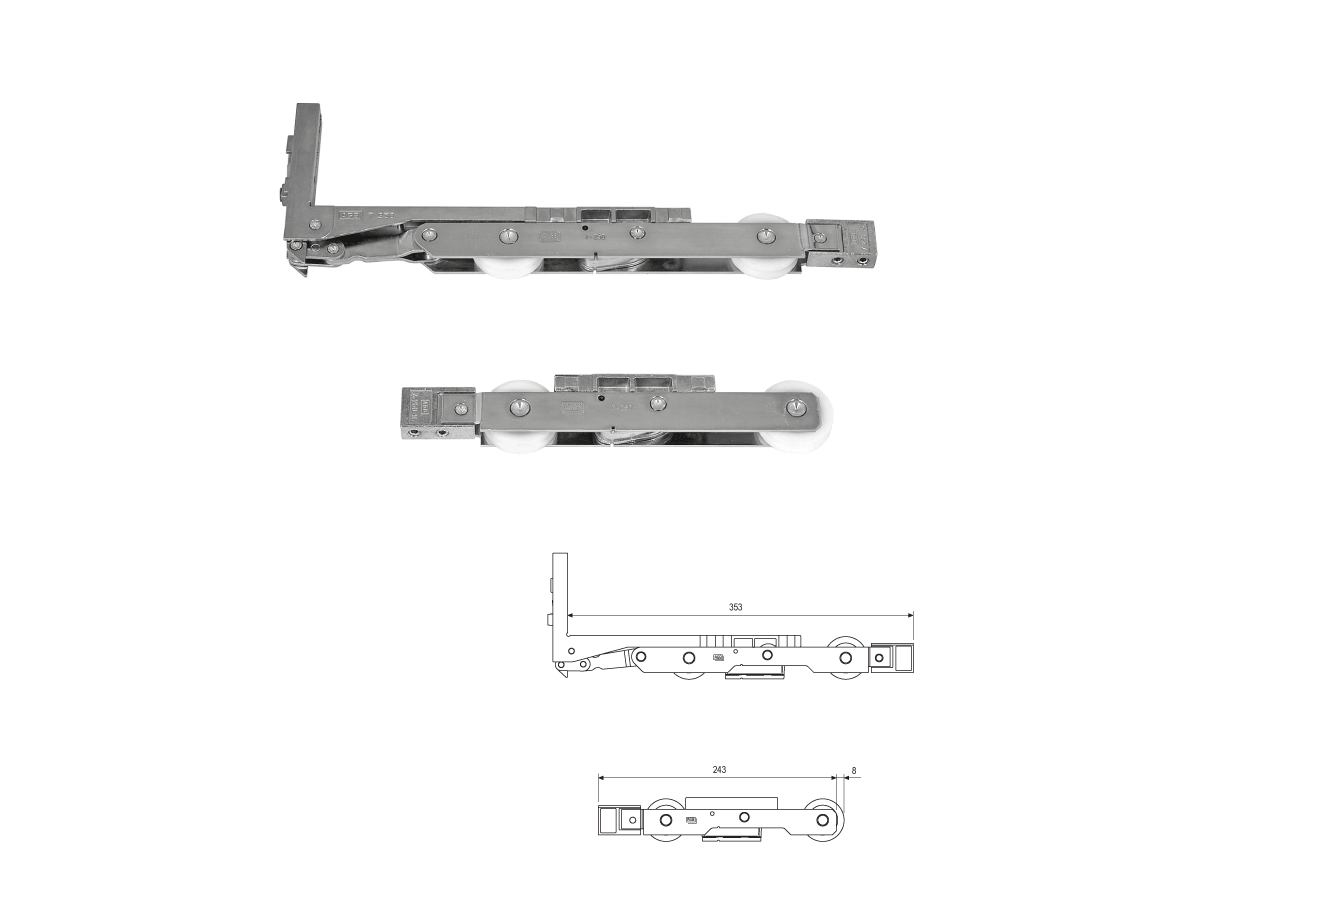 Kit carrelli per alzante g041040000 - AGB